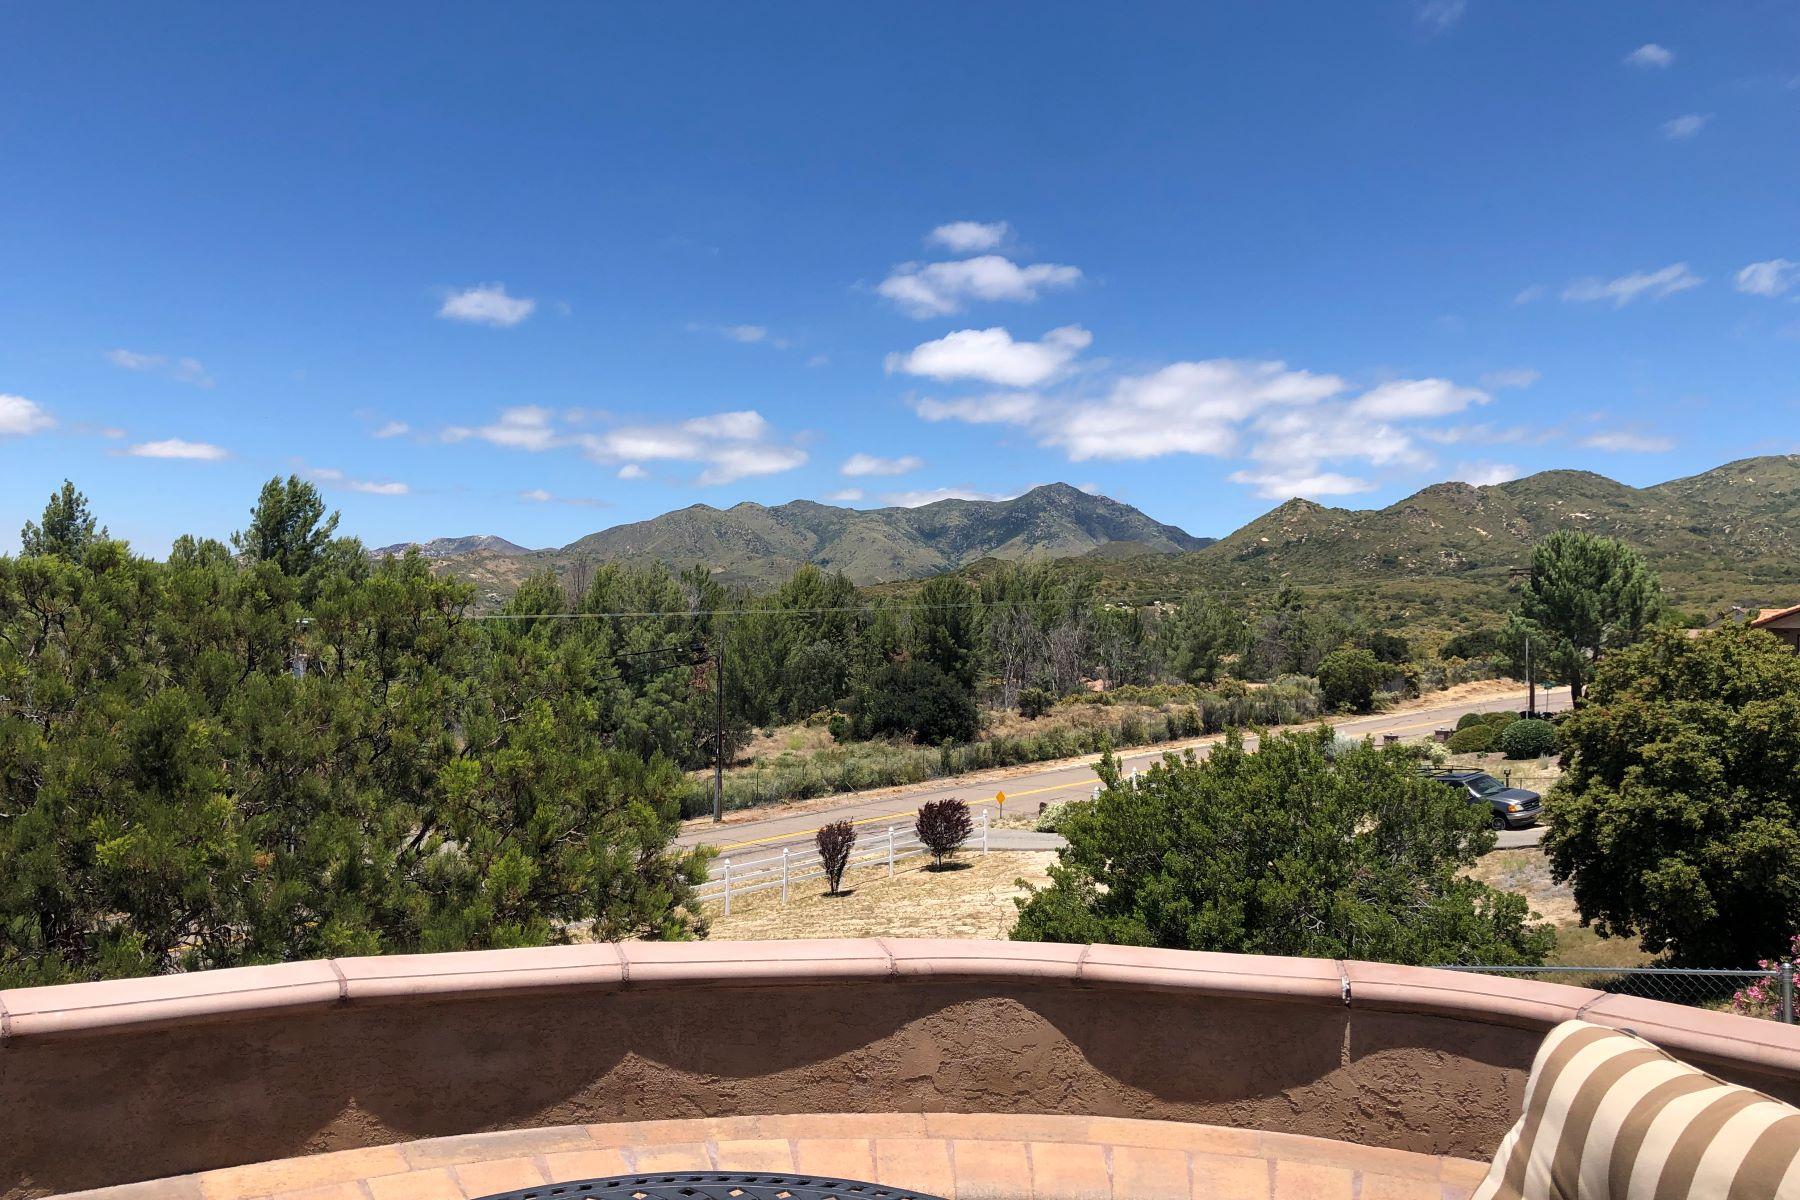 Single Family Homes for Sale at 32221 Camino San Ignacio Warner Springs, California 92086 United States